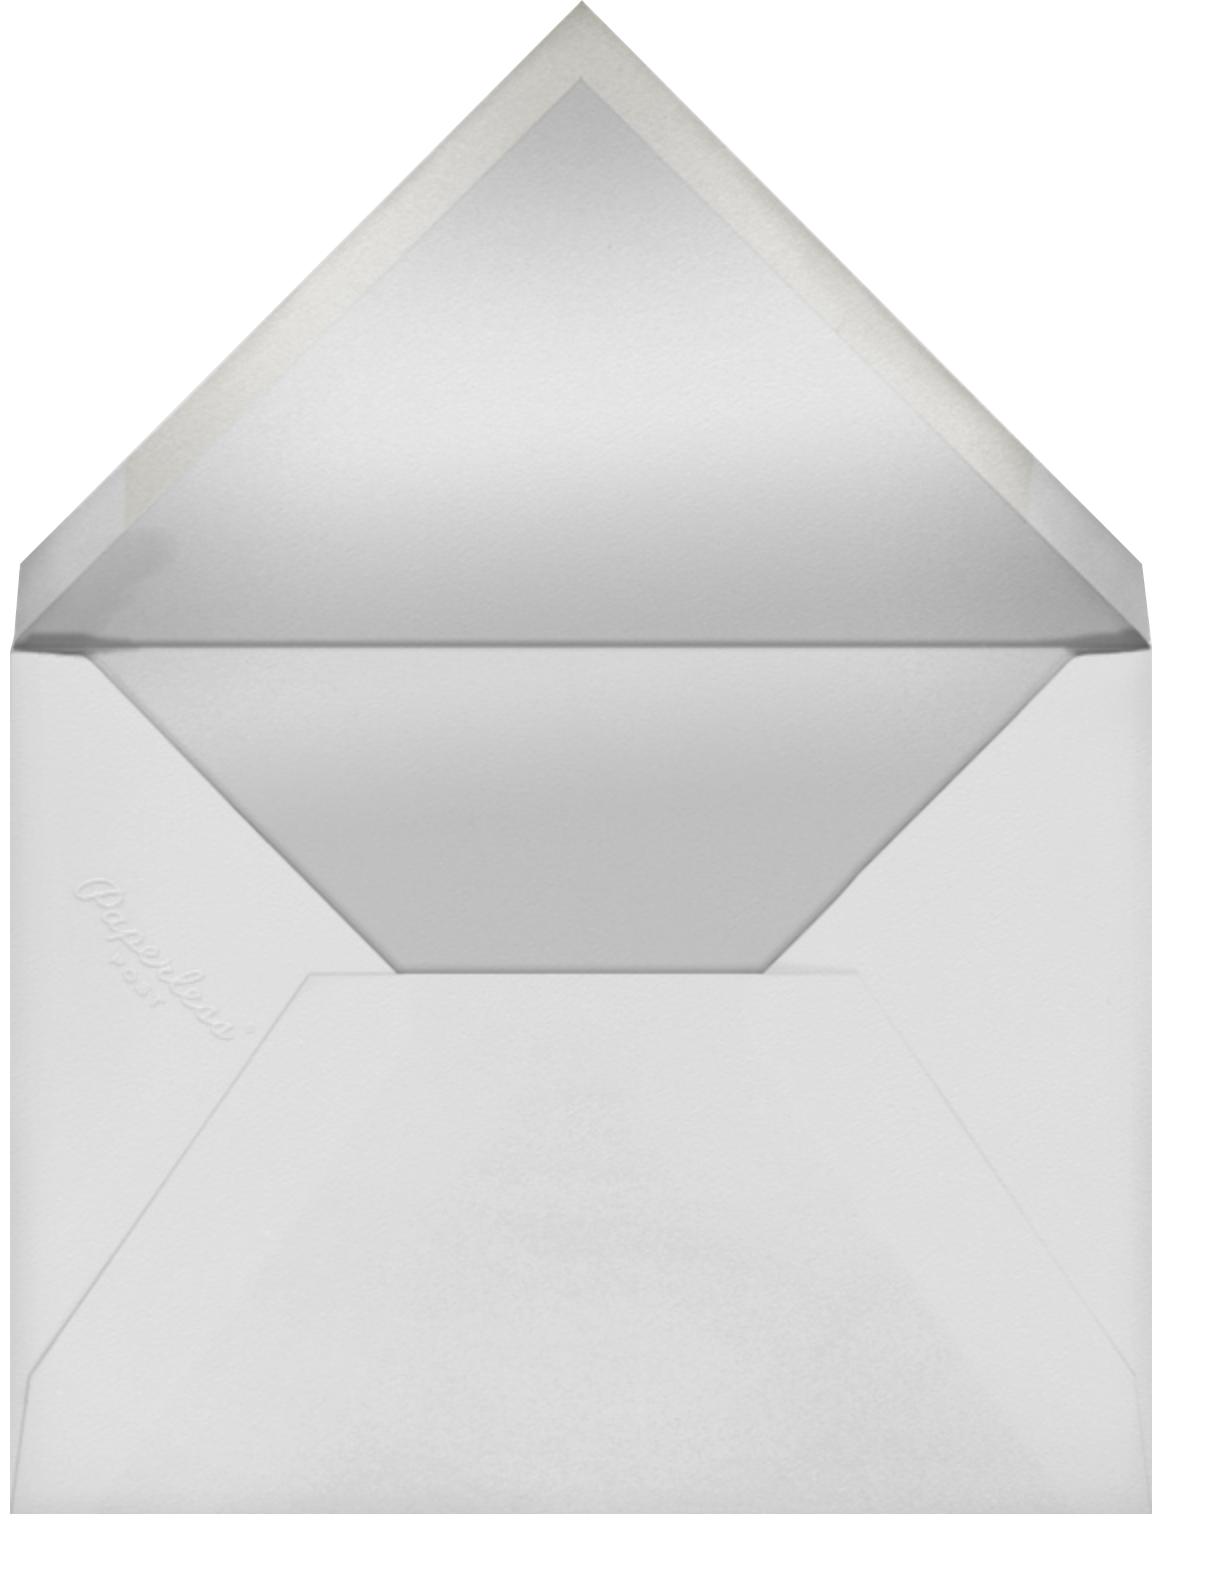 Belle Boulevard (Menu) - kate spade new york - Menus - envelope back